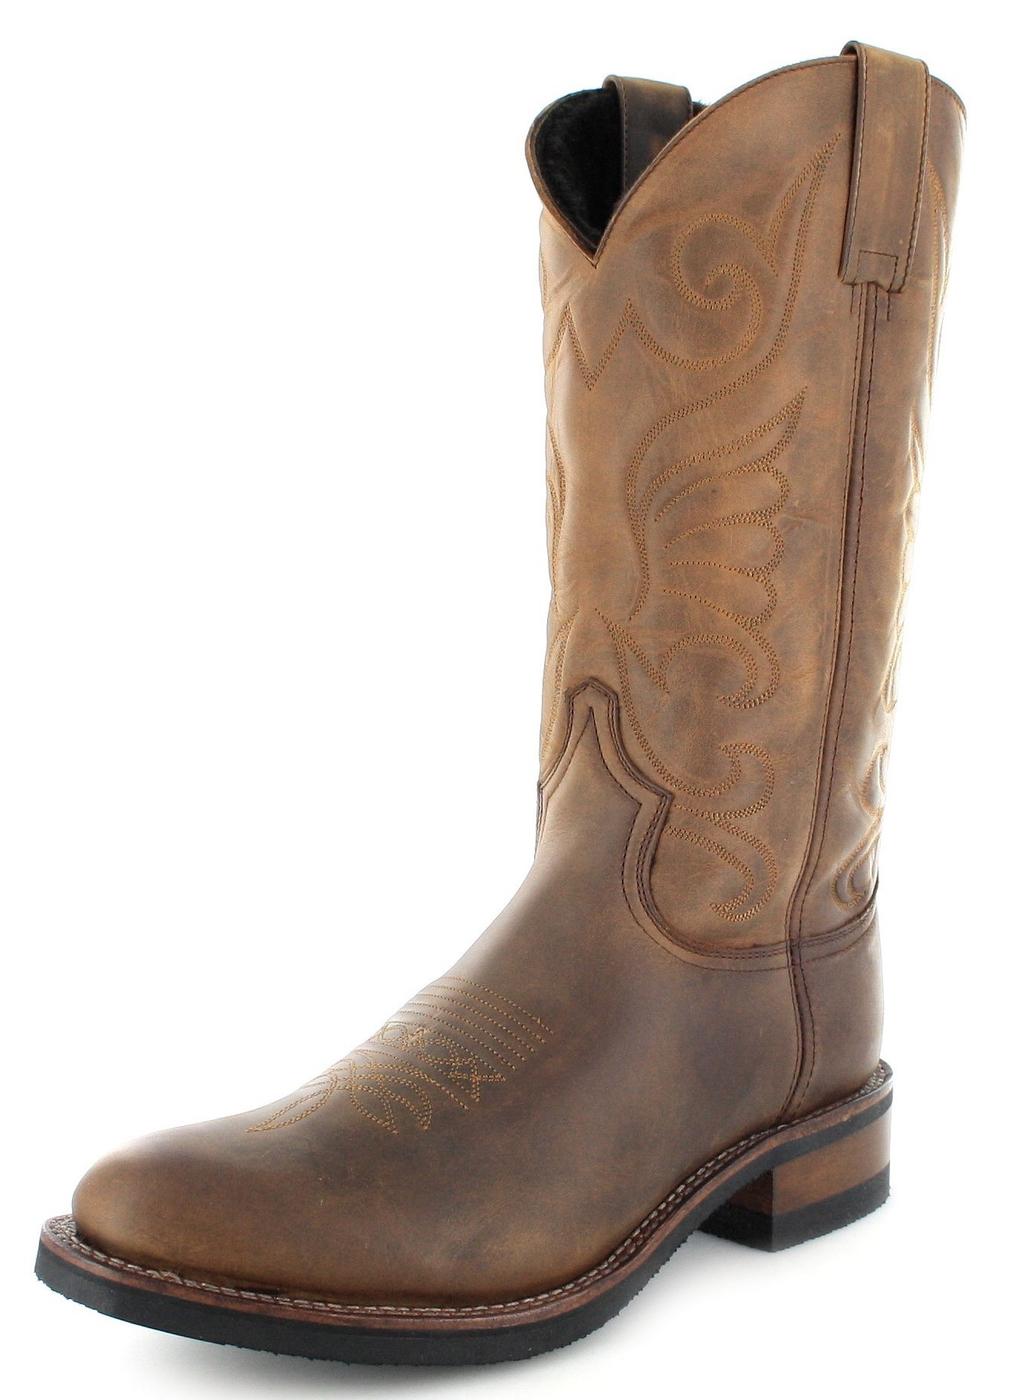 Sendra Boots 9263 Tang Damen Westernreitstiefel mit Merinofell Futter - braun